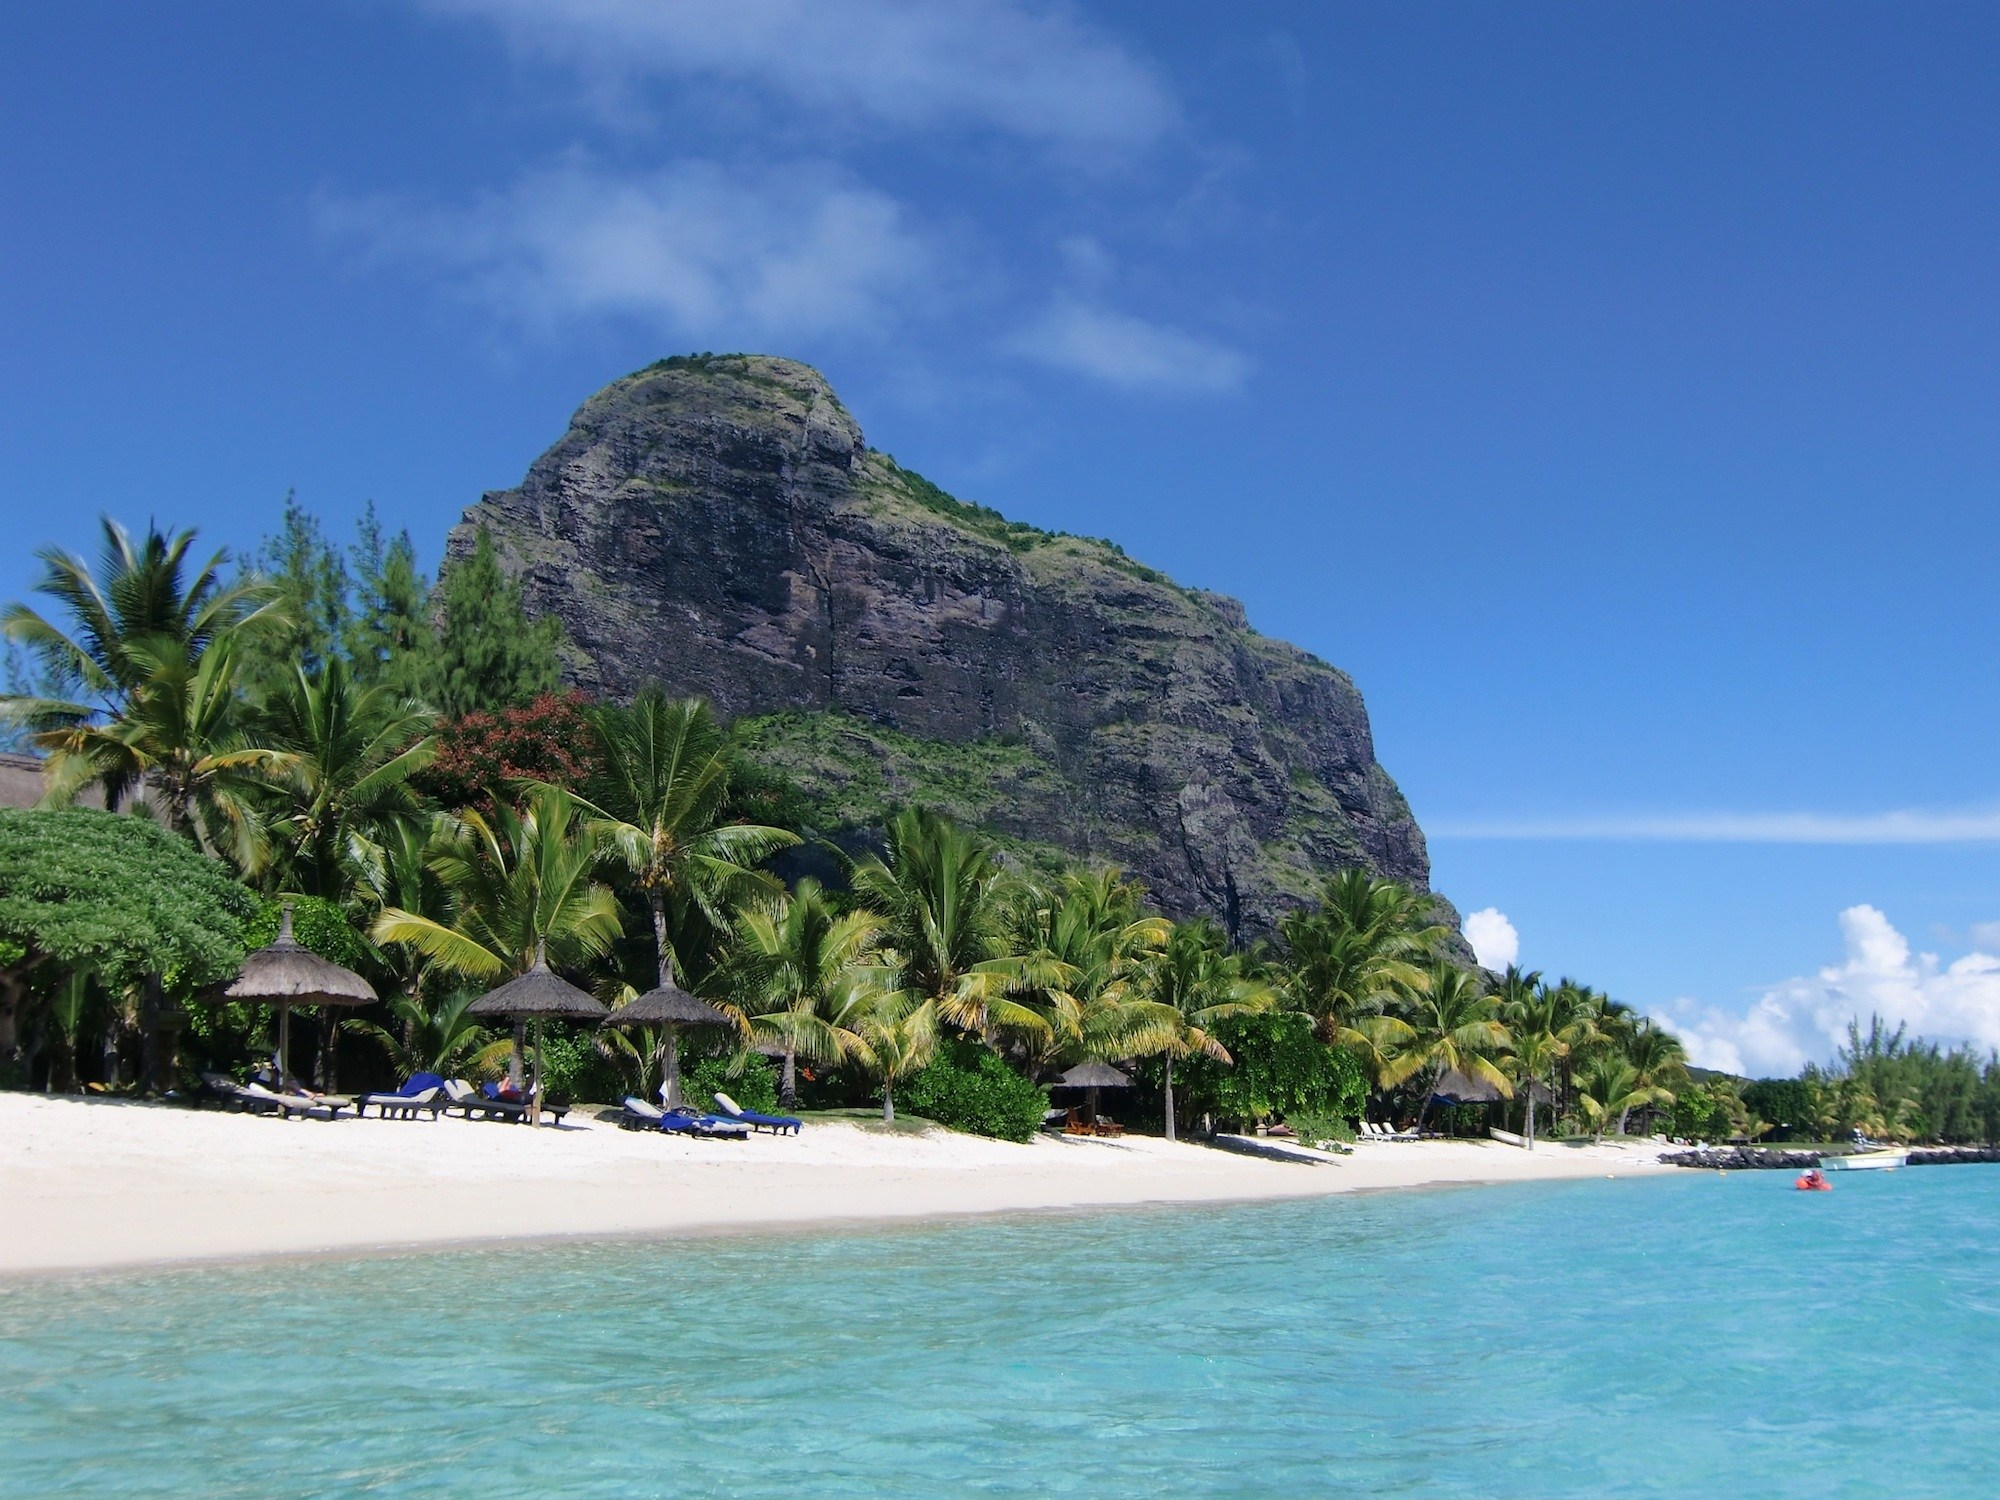 Mauritius Rock